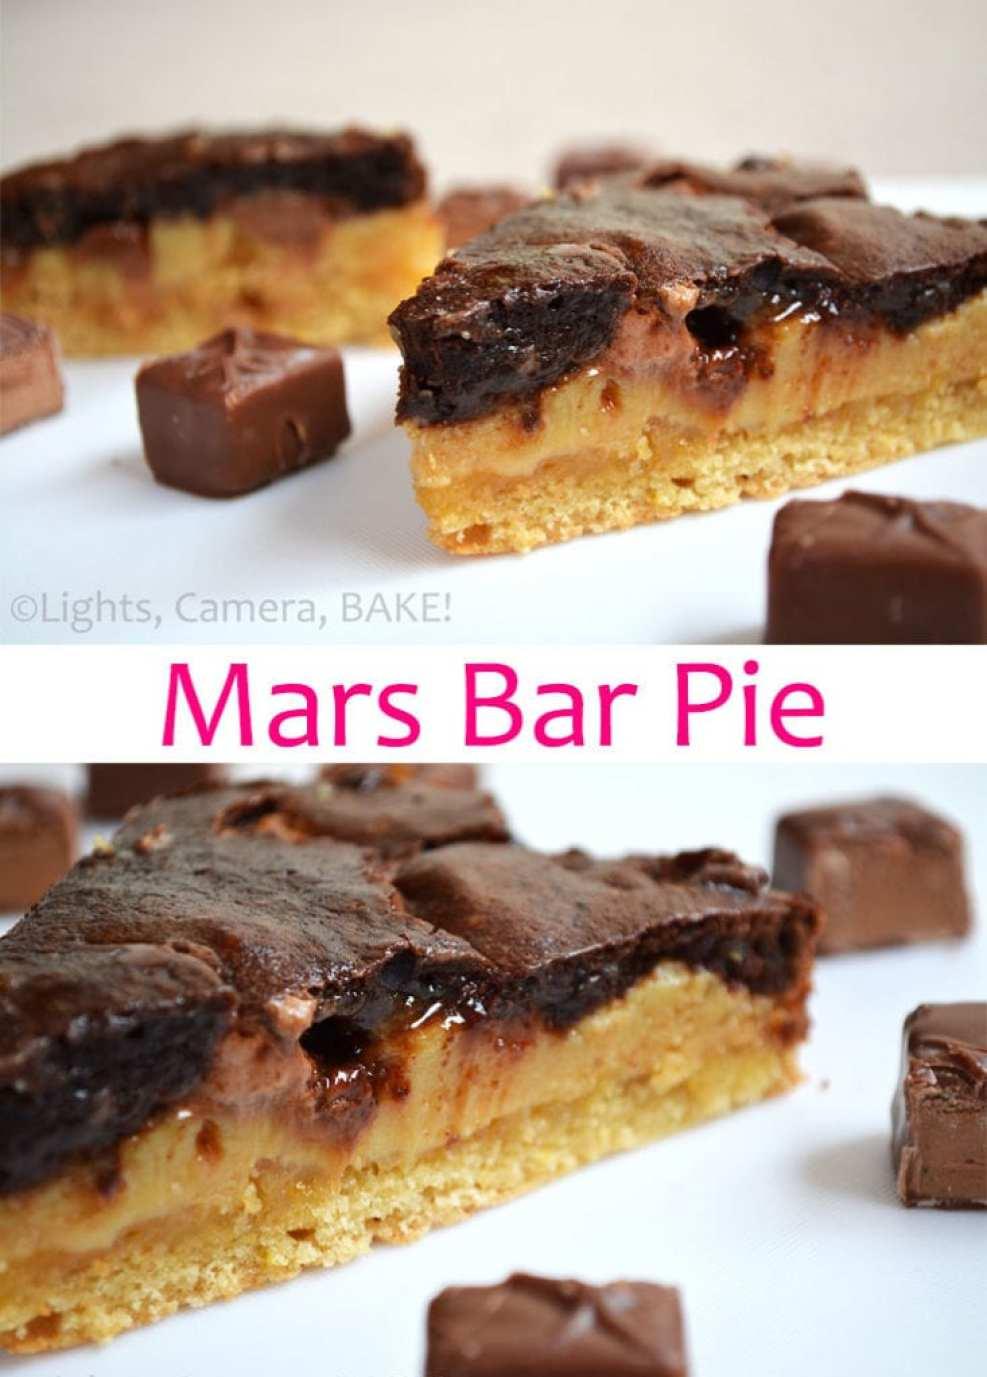 Mars Bar Pie. Ooey, gooey caramel chocolate pie packed full of mars bars! This is one of my all time favourites! #marsbarpie #pierecipe #chocolate